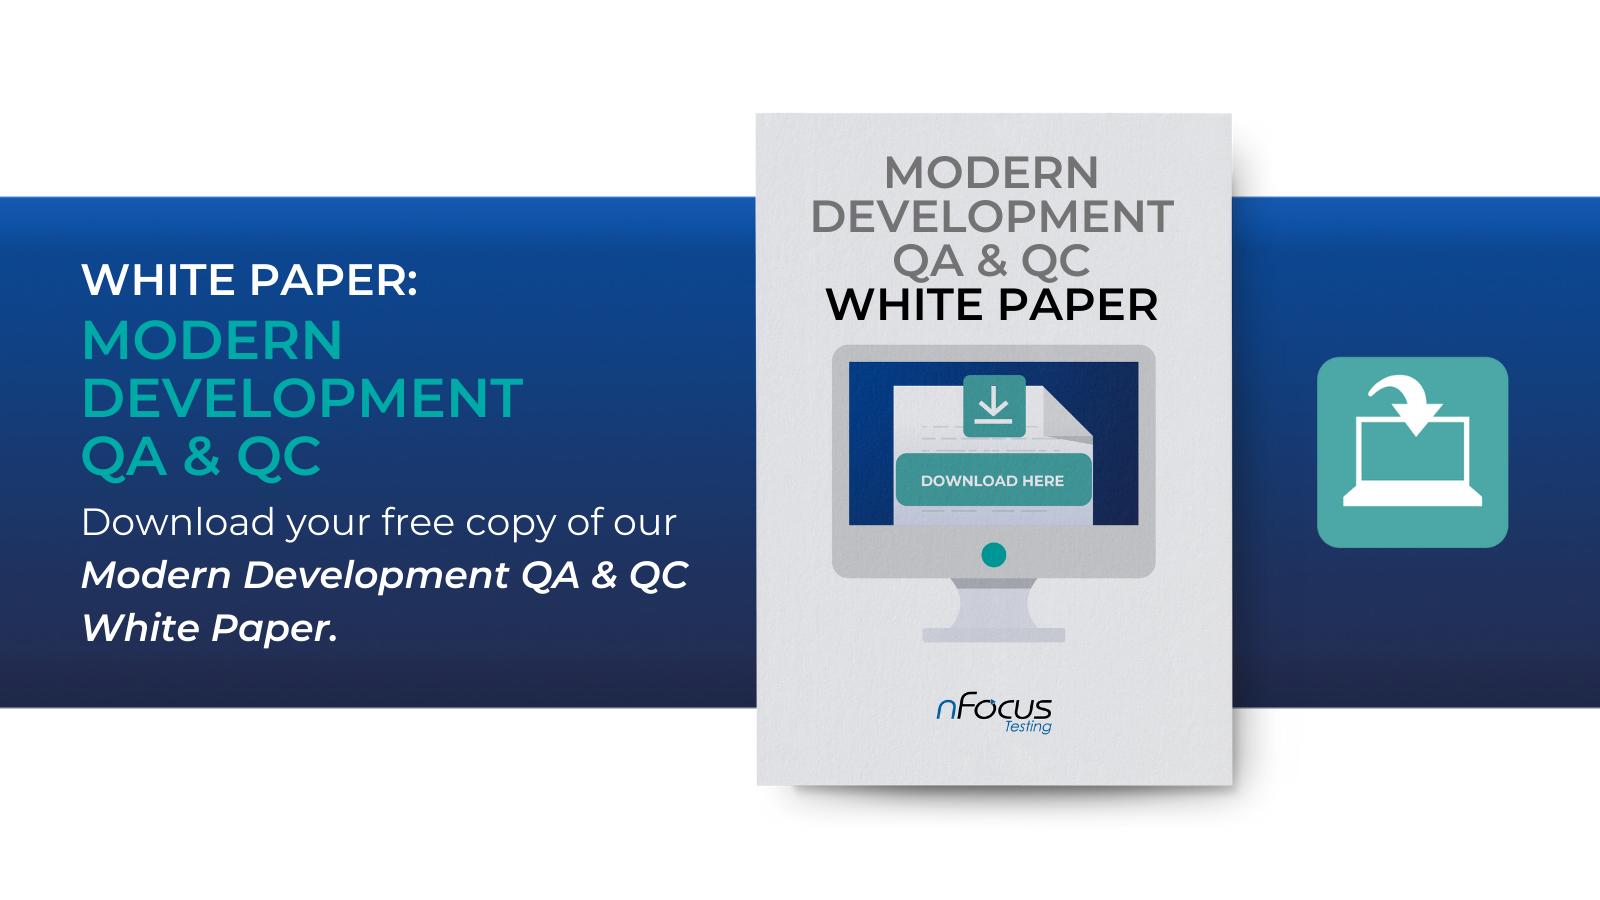 Modern Development QA & QC